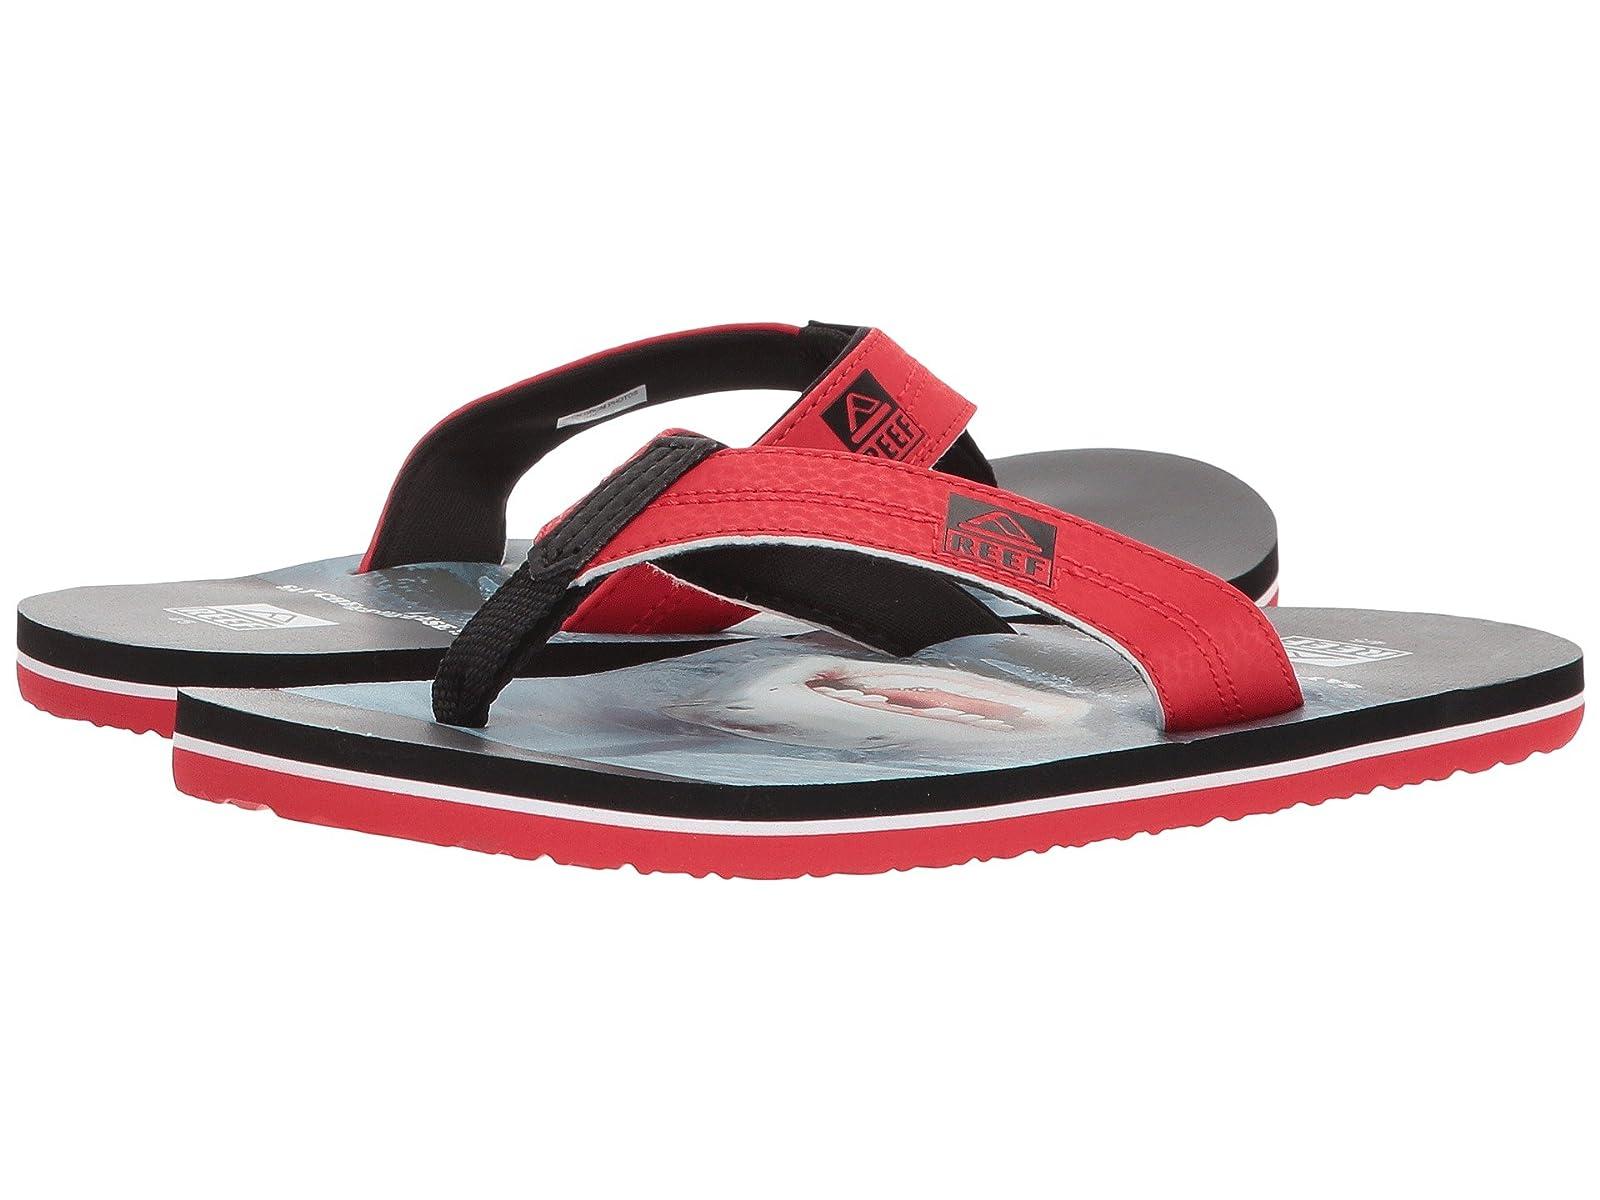 Reef Kids Grom Photos (Infant/Toddler/Little Kid/Big Kid)Atmospheric grades have affordable shoes